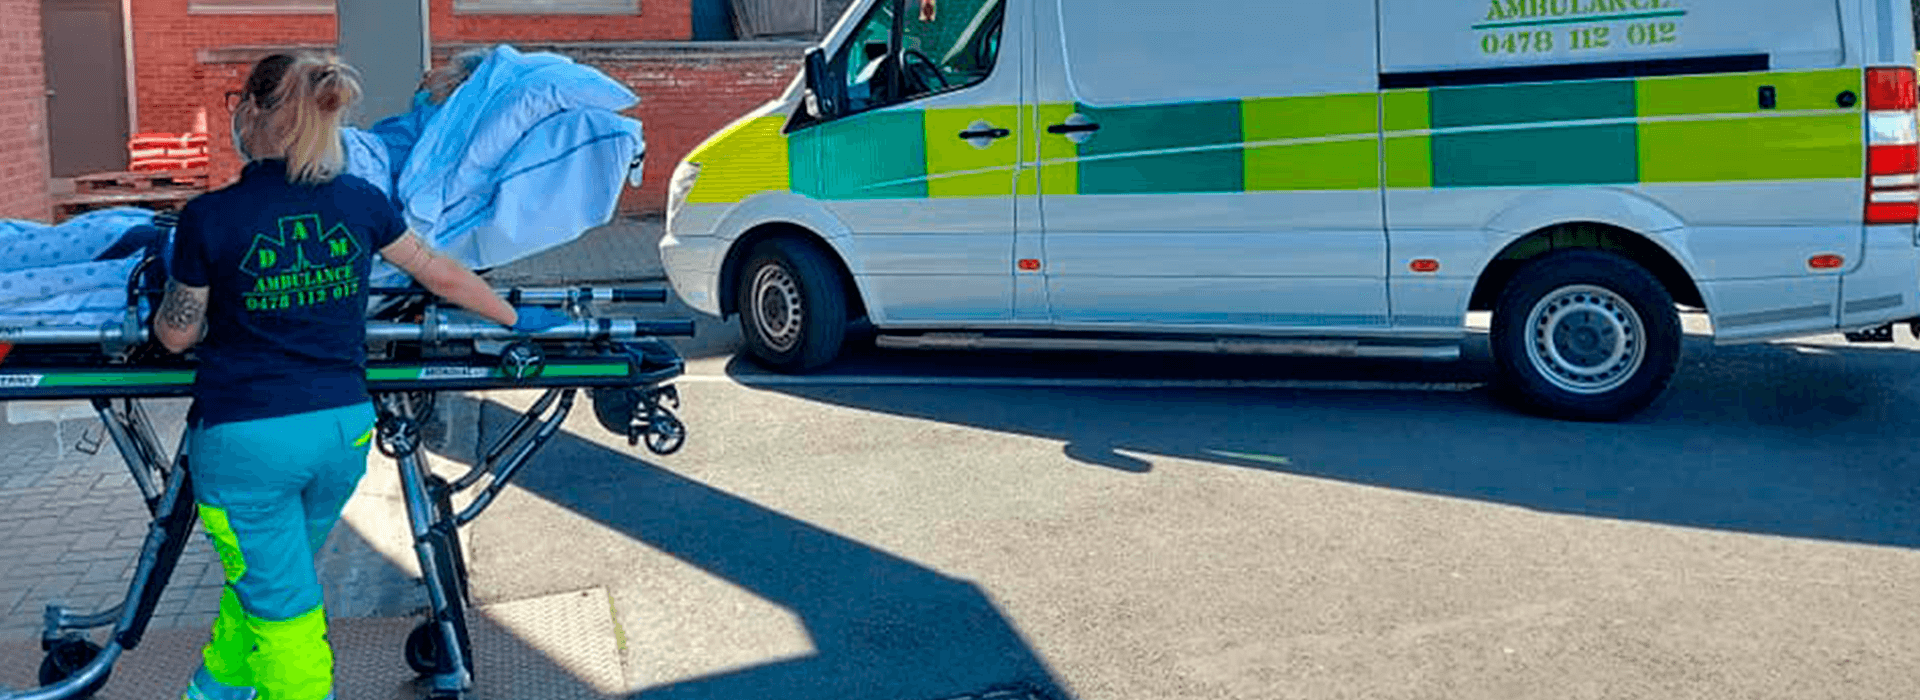 transport en urgence sur brancard vers l'ambulance Dam Ambulance